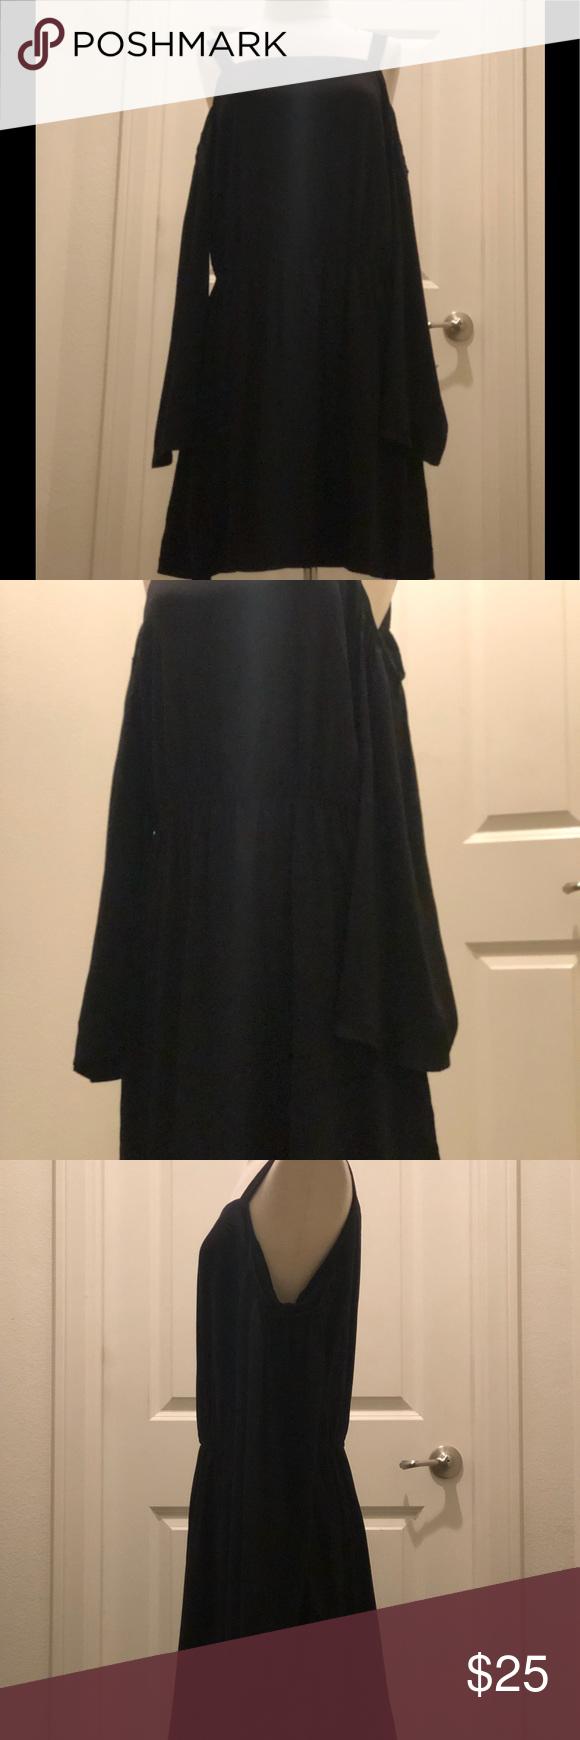 JustFab Cold Shoulder Dress Size Large NWT My Posh Picks